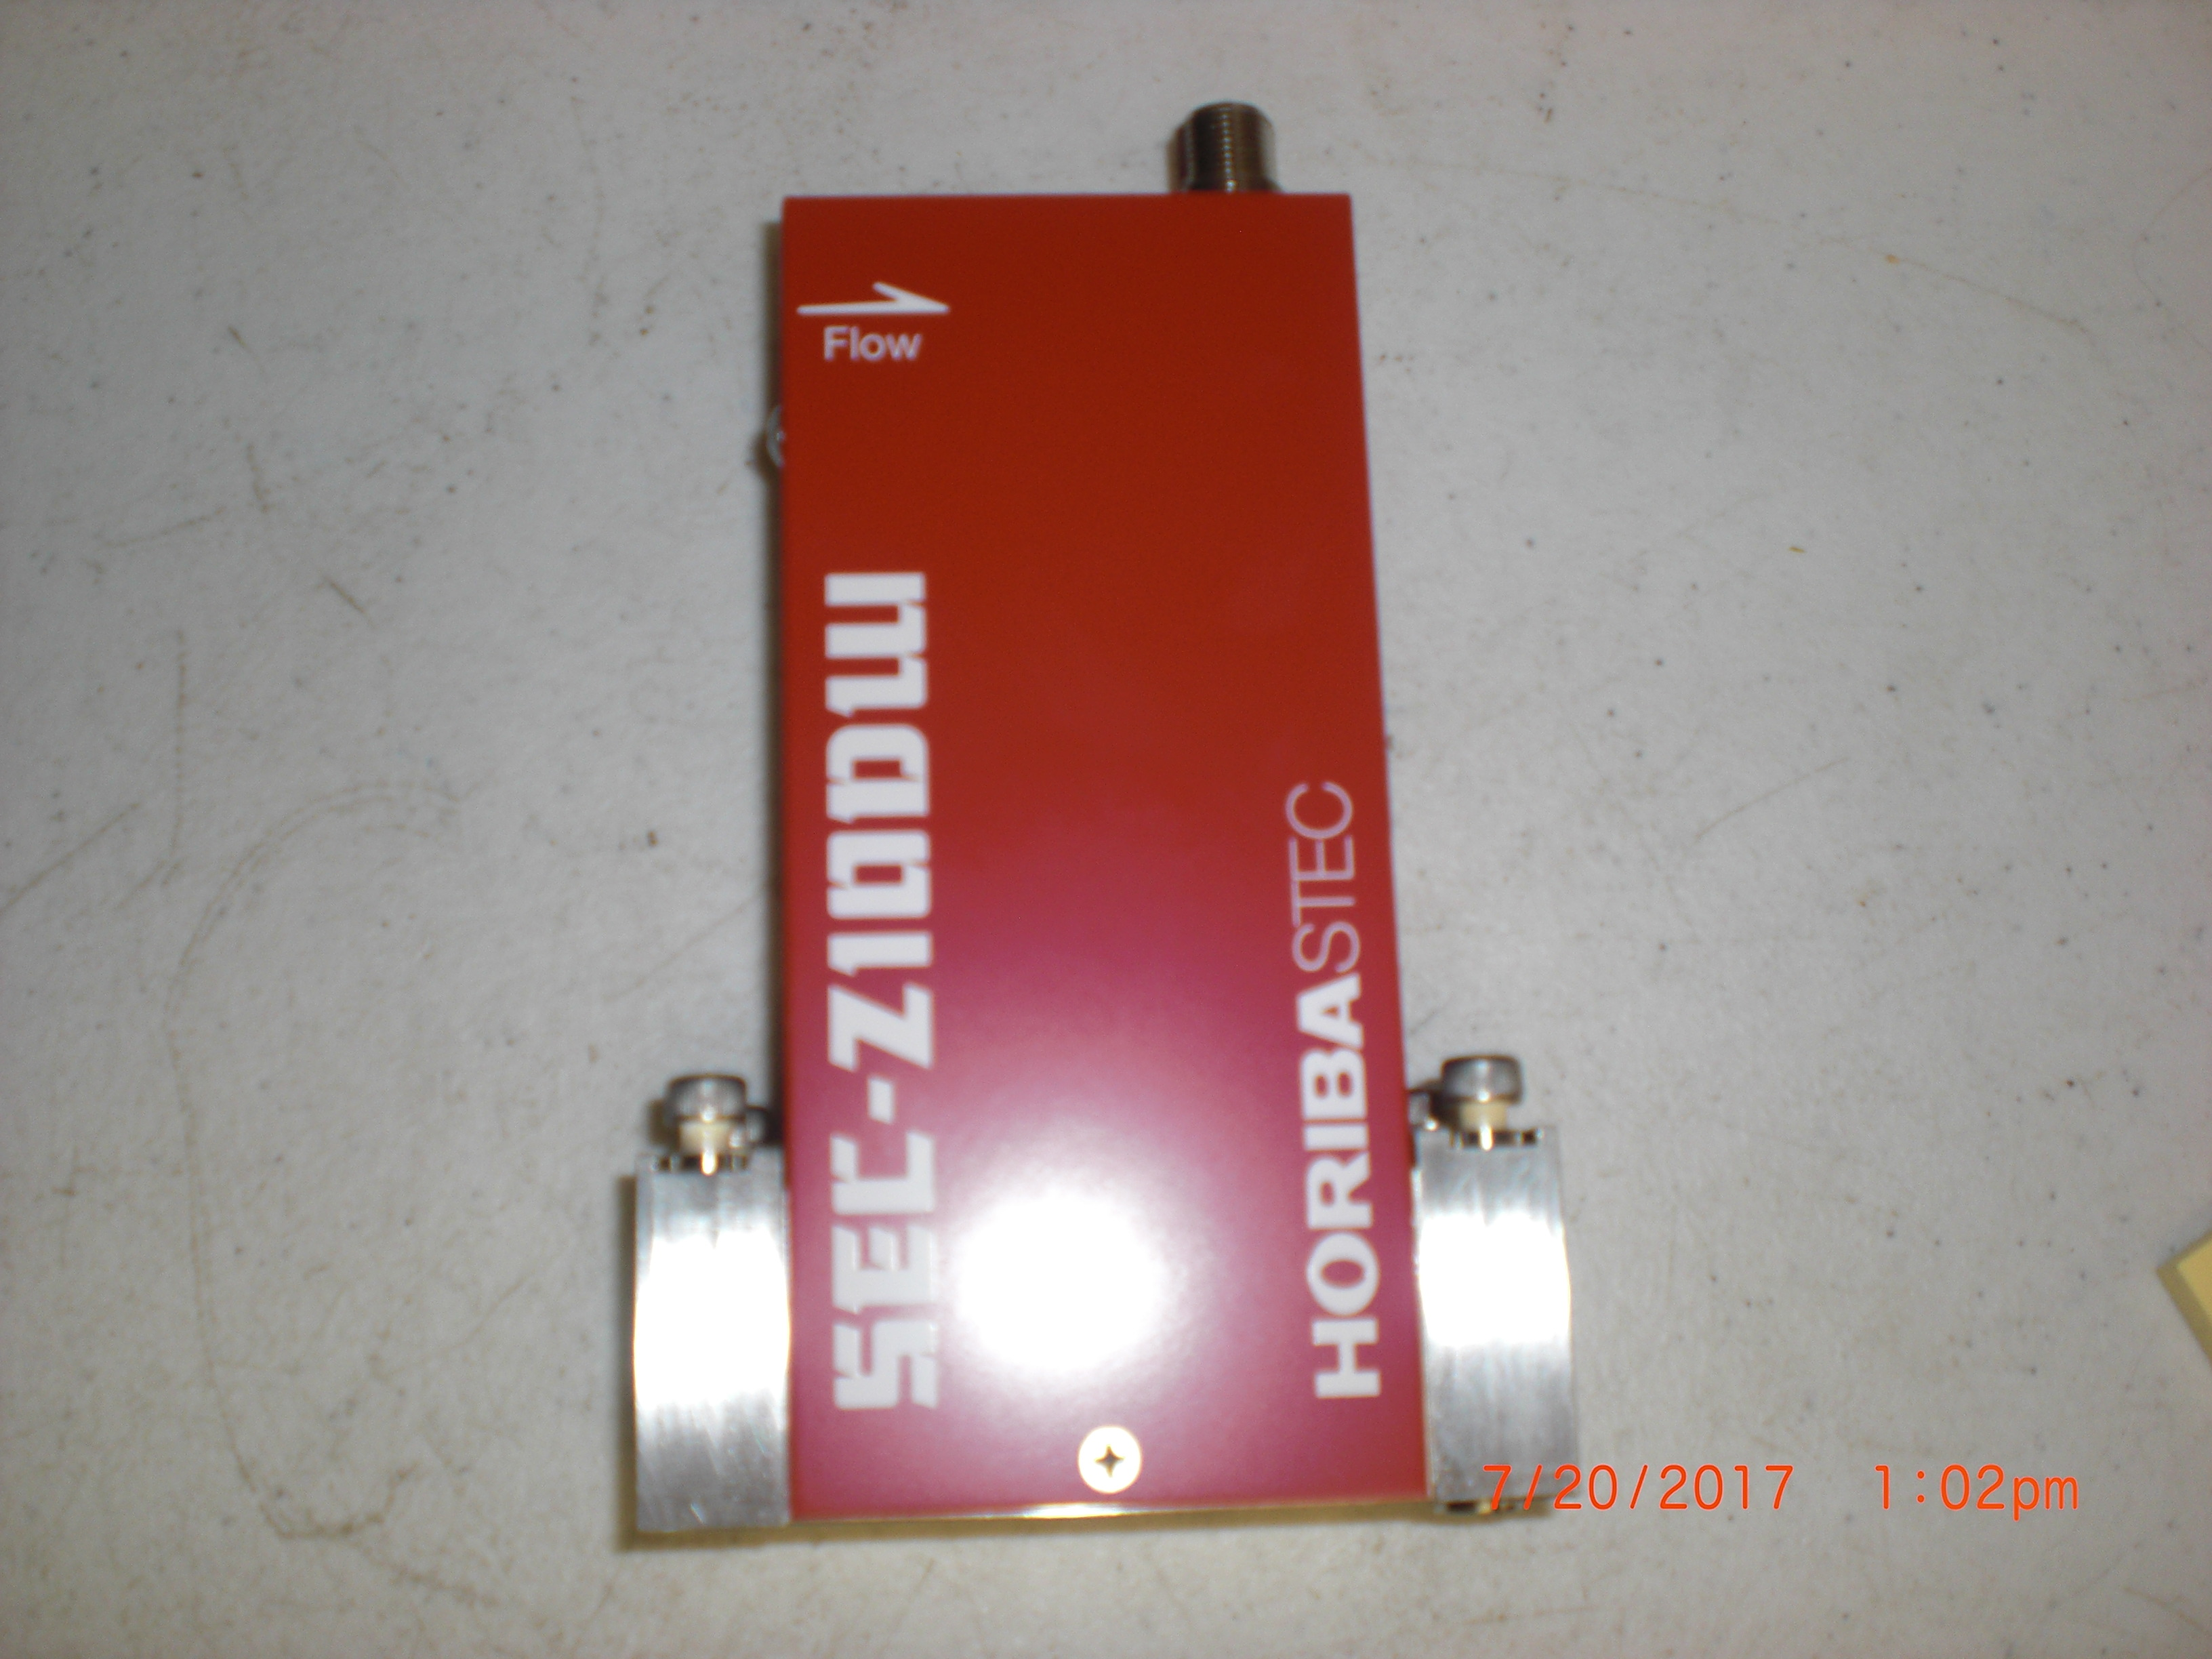 MFC HOREBIA / STEC SEC-Z12DWM-NH3-5SLM Harvested never installed System